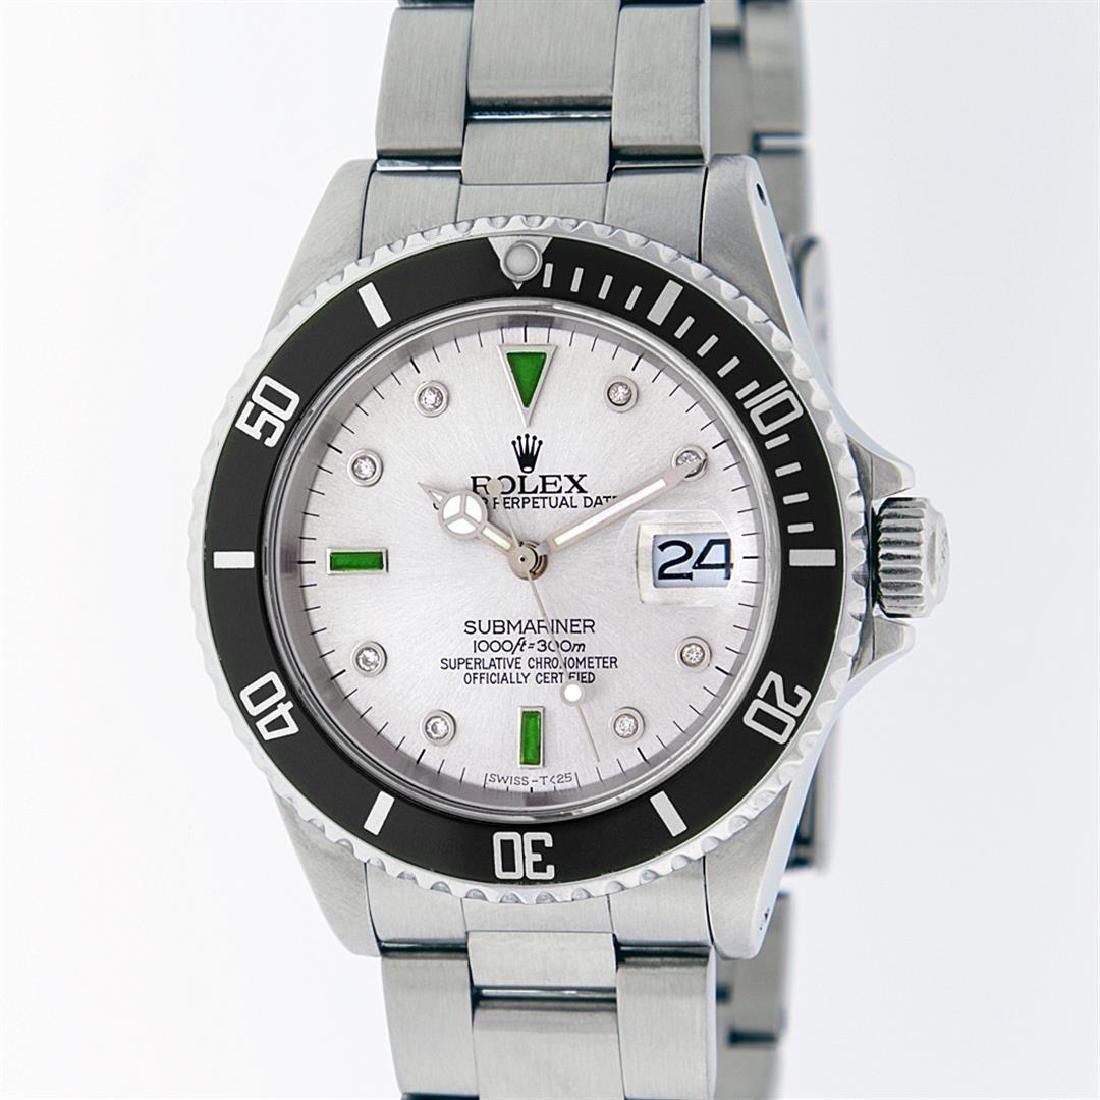 Rolex Stainless Steel Emerald and Diamond Submariner